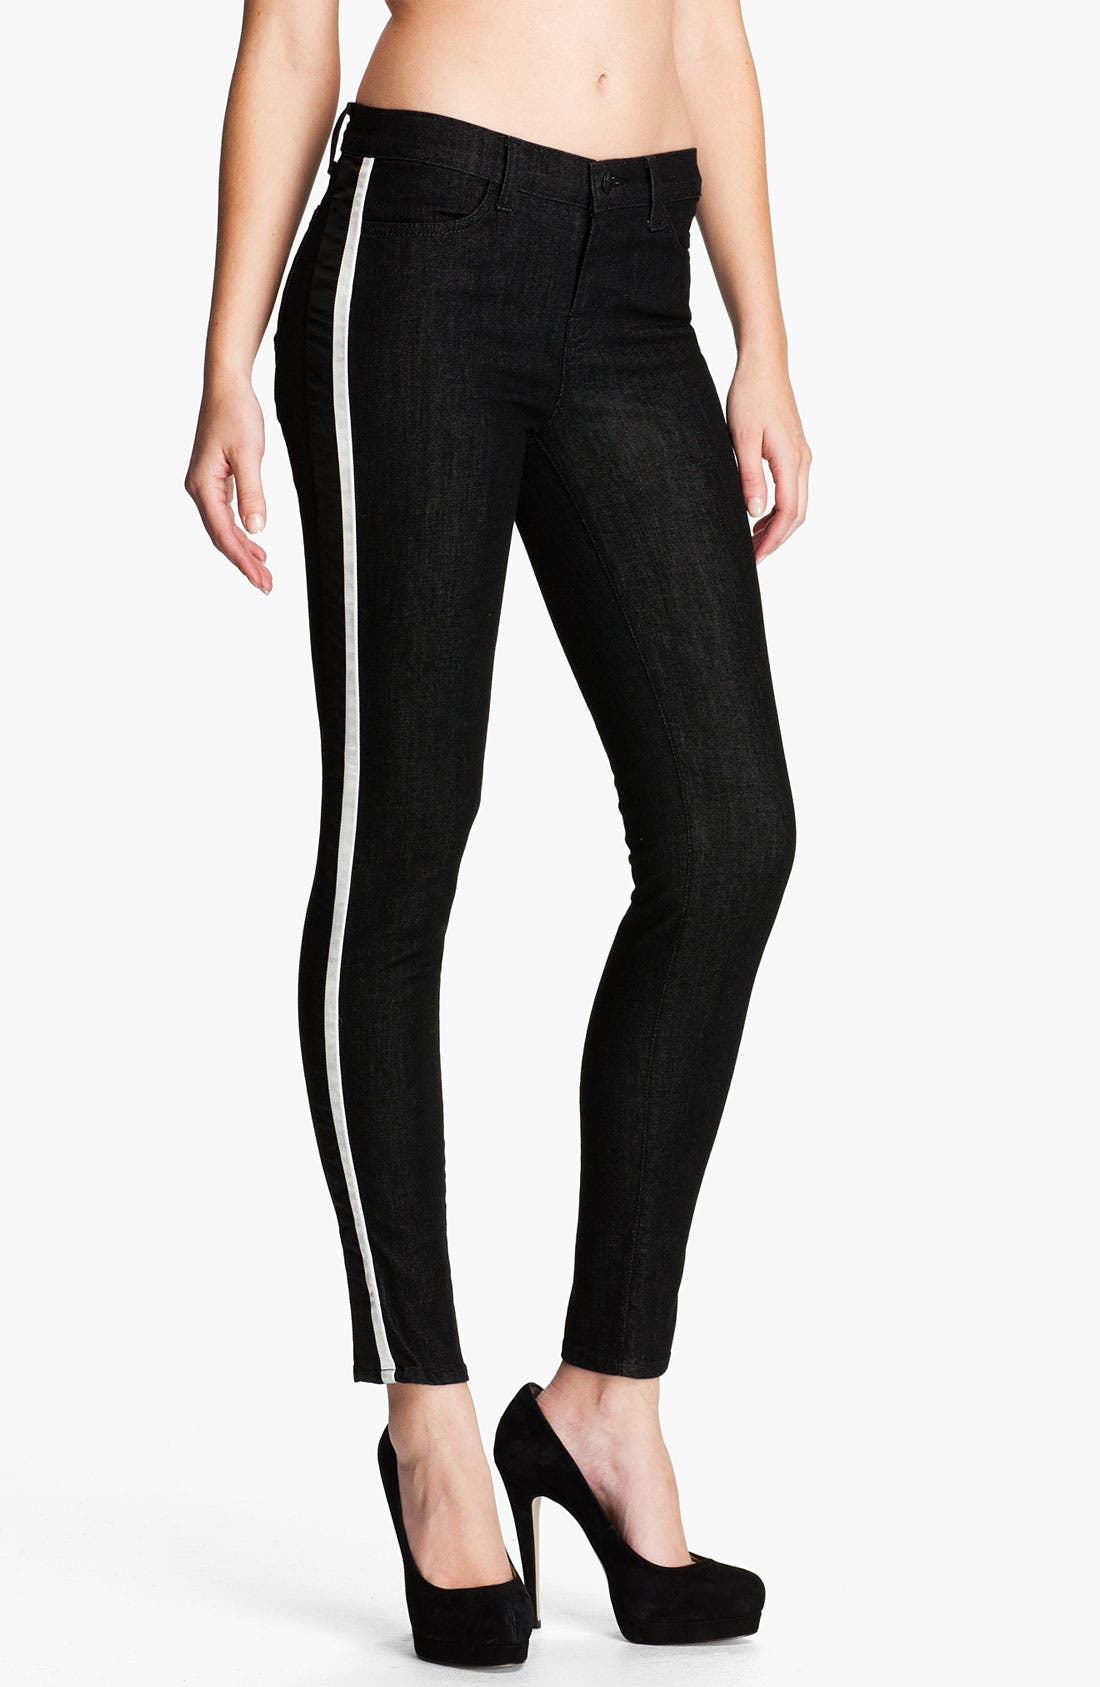 Main Image - J Brand 'Rowan' Stripe Skinny Jeans (Tux)